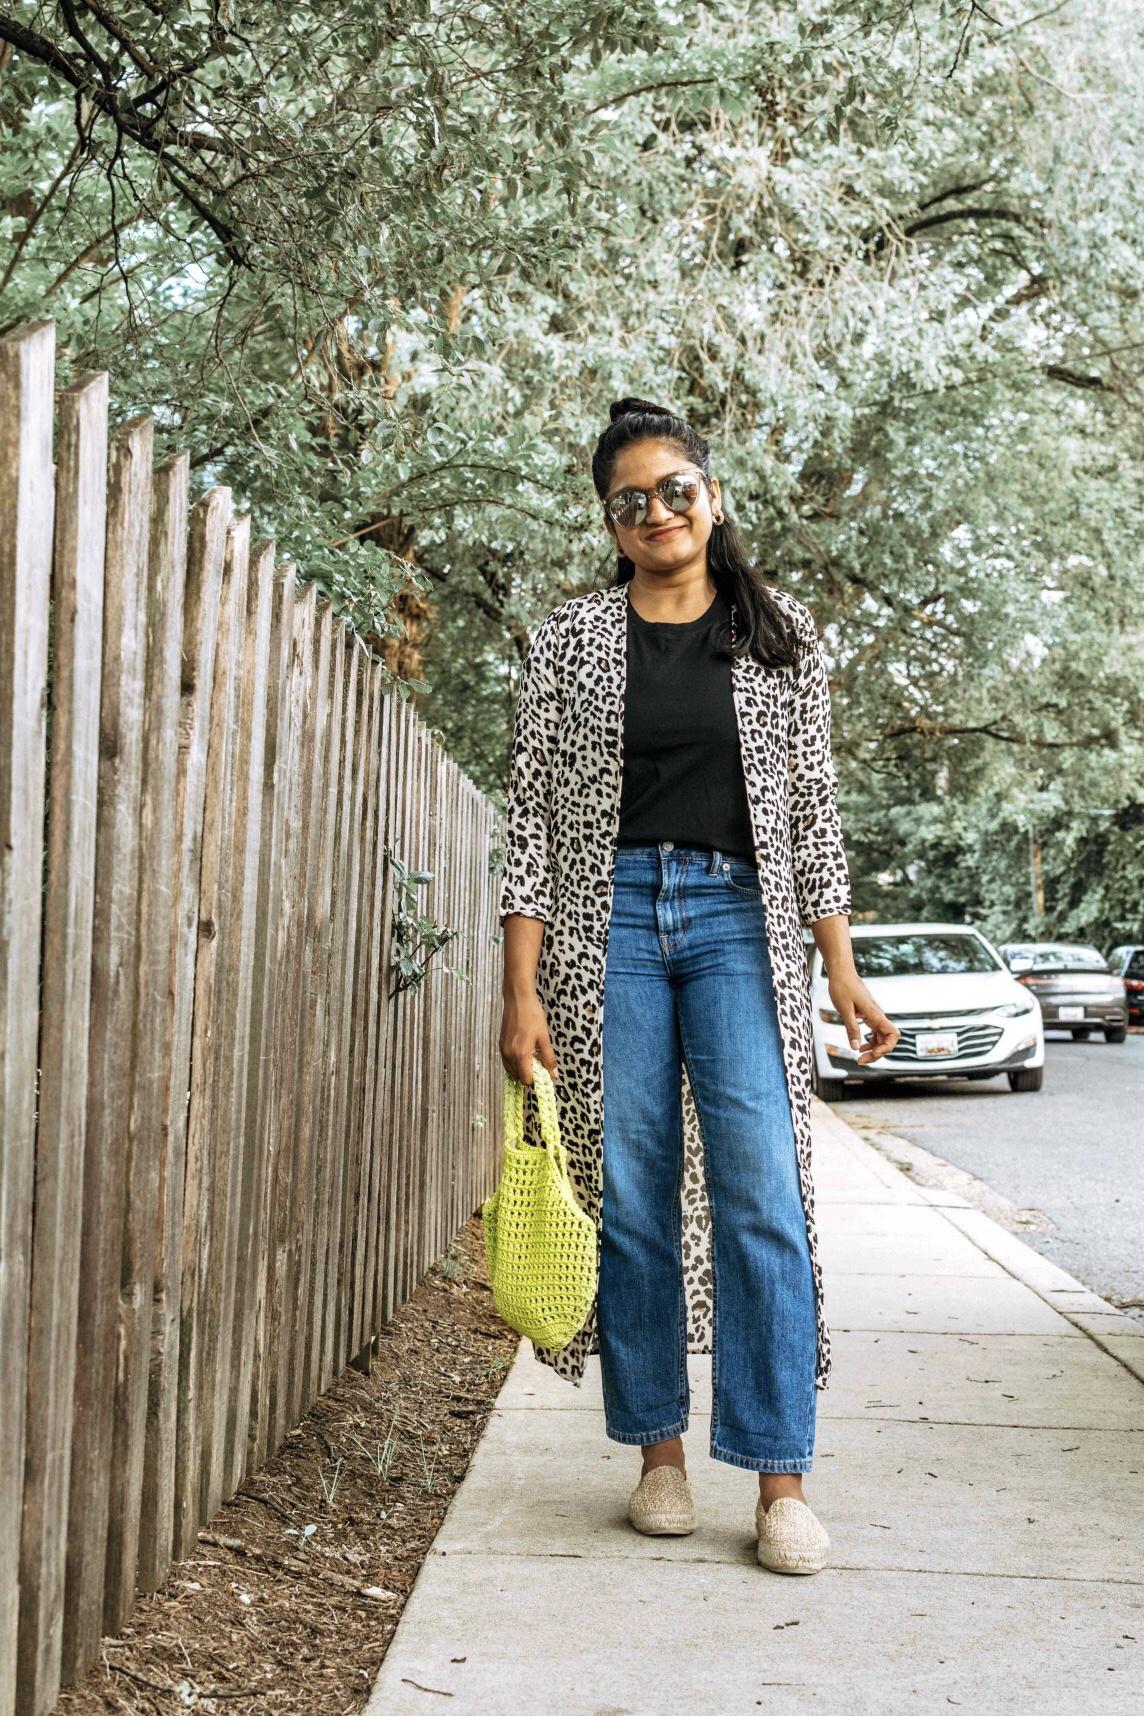 Wearing Everlane summer jeans, Cotton Box-Cut Tee, leopard print kimono, Raffia Espadrilles 6